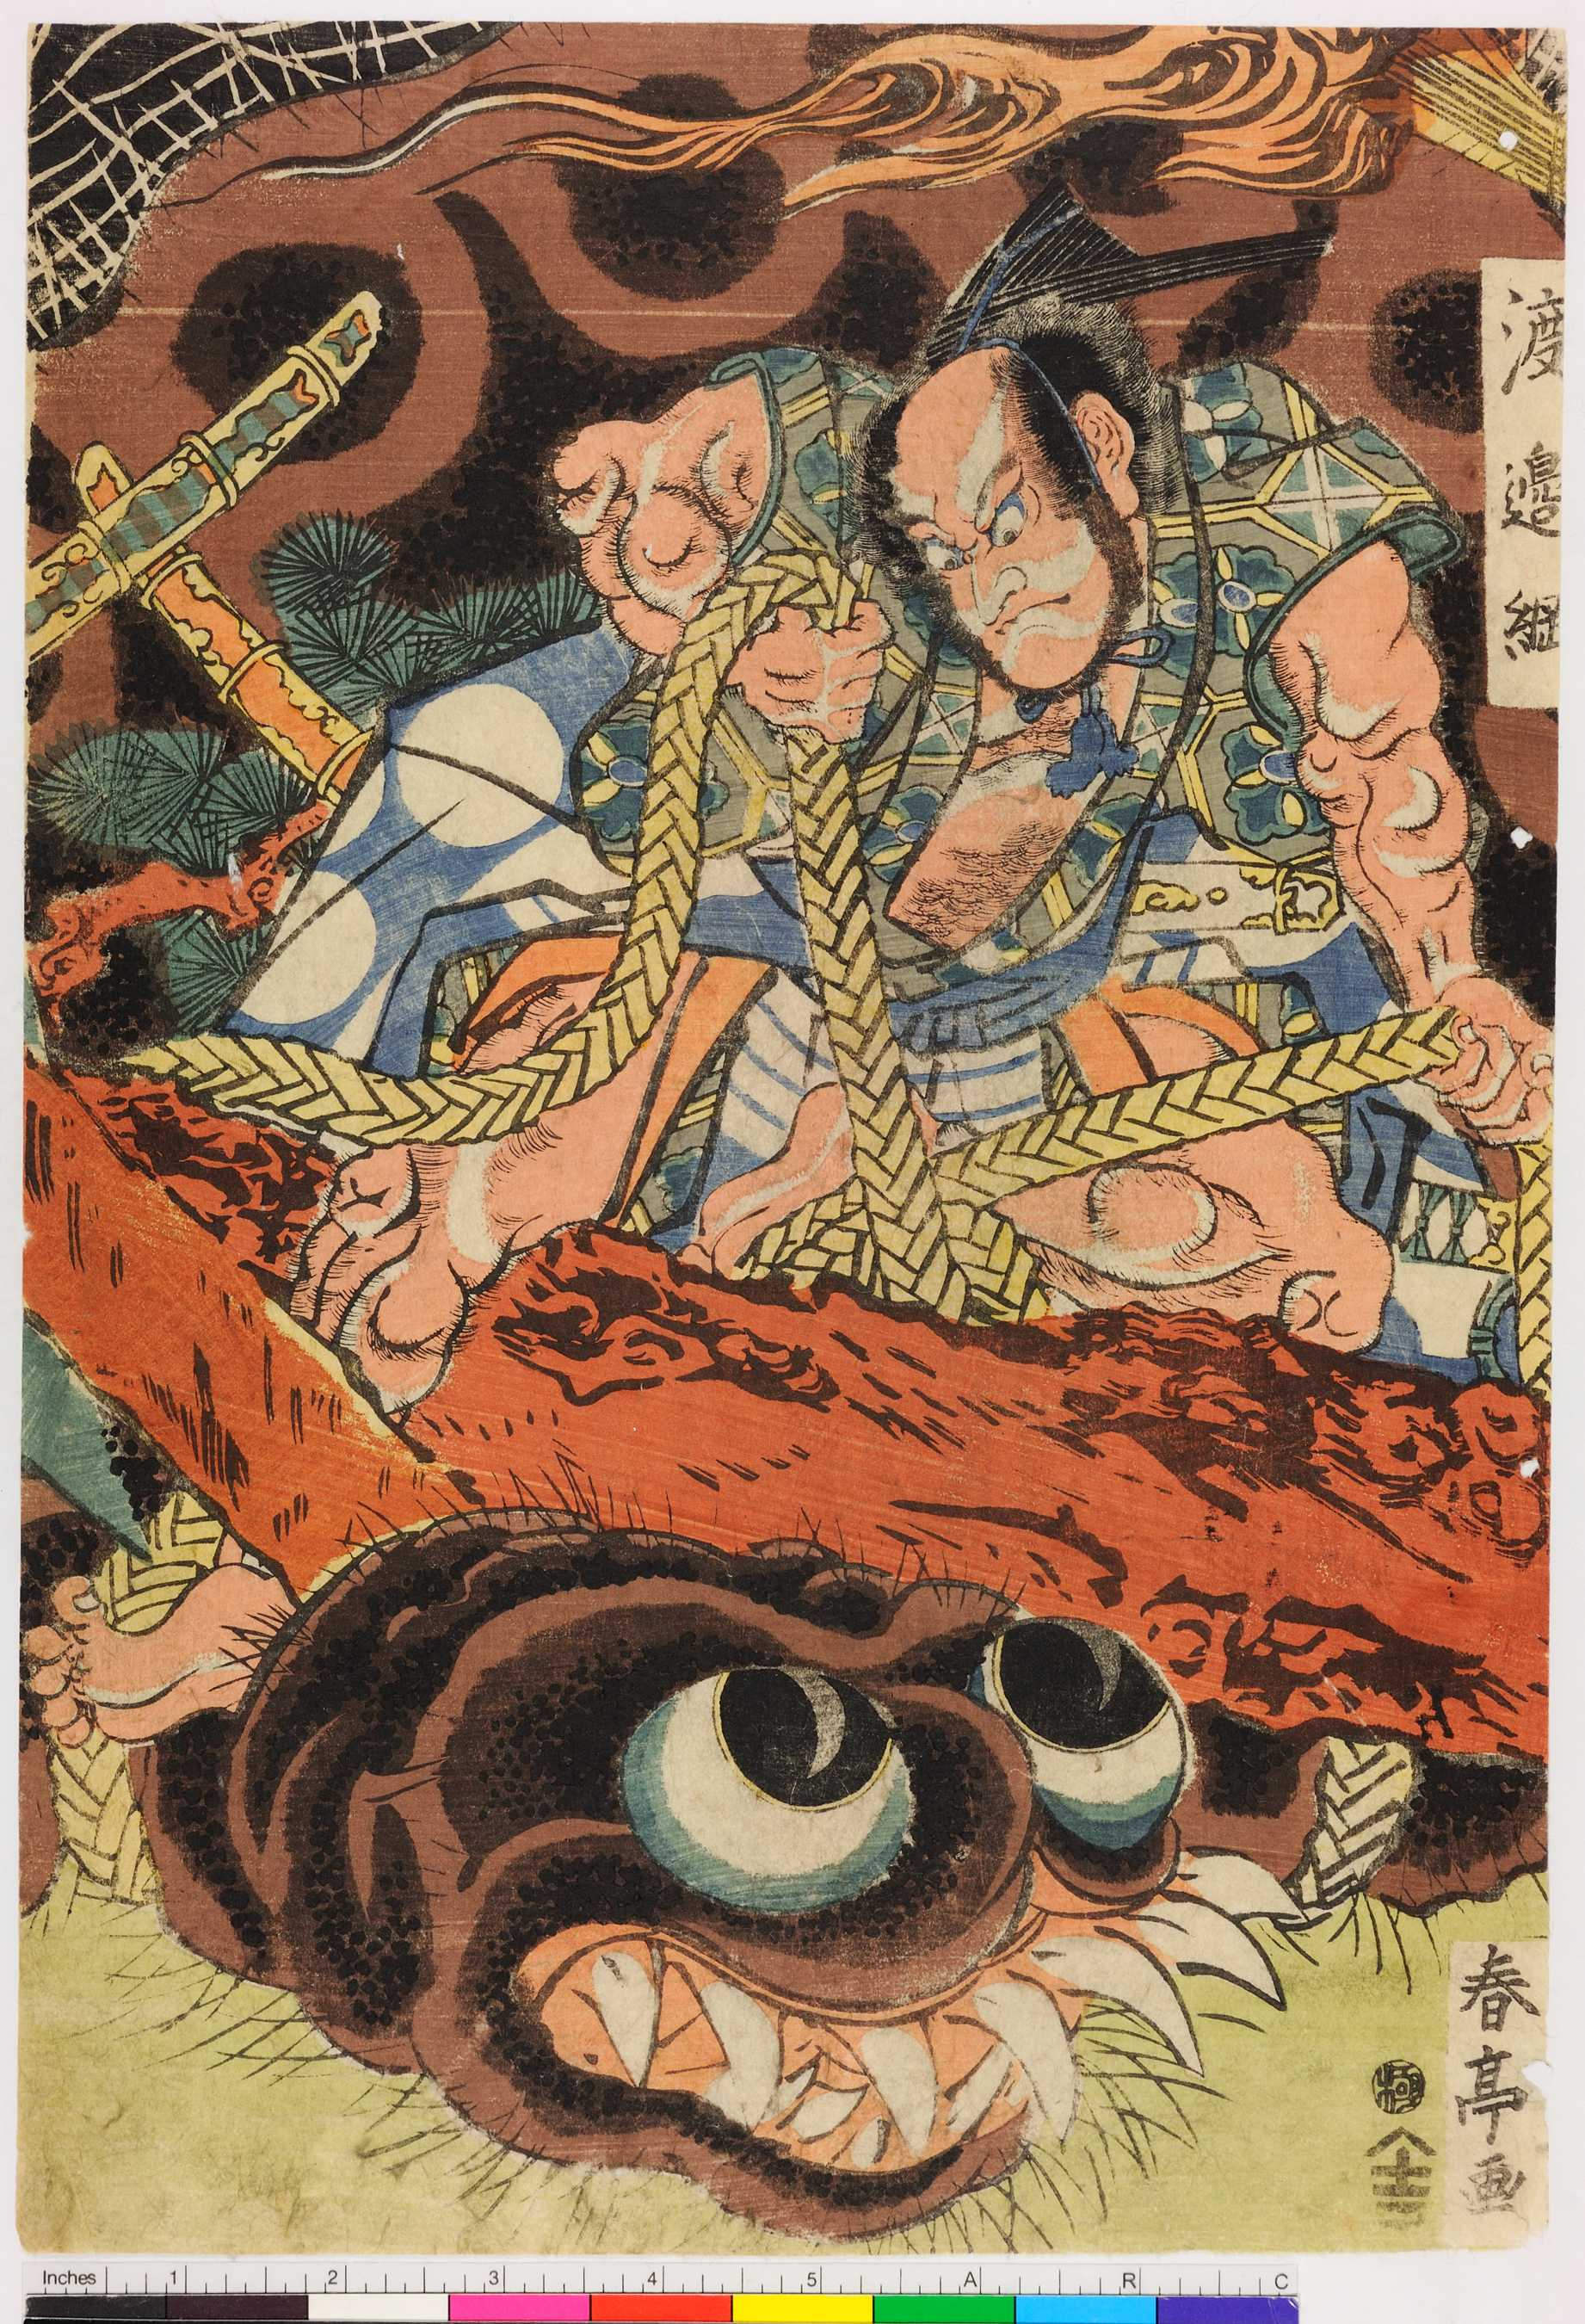 A2 「日本の伝説・異界」展